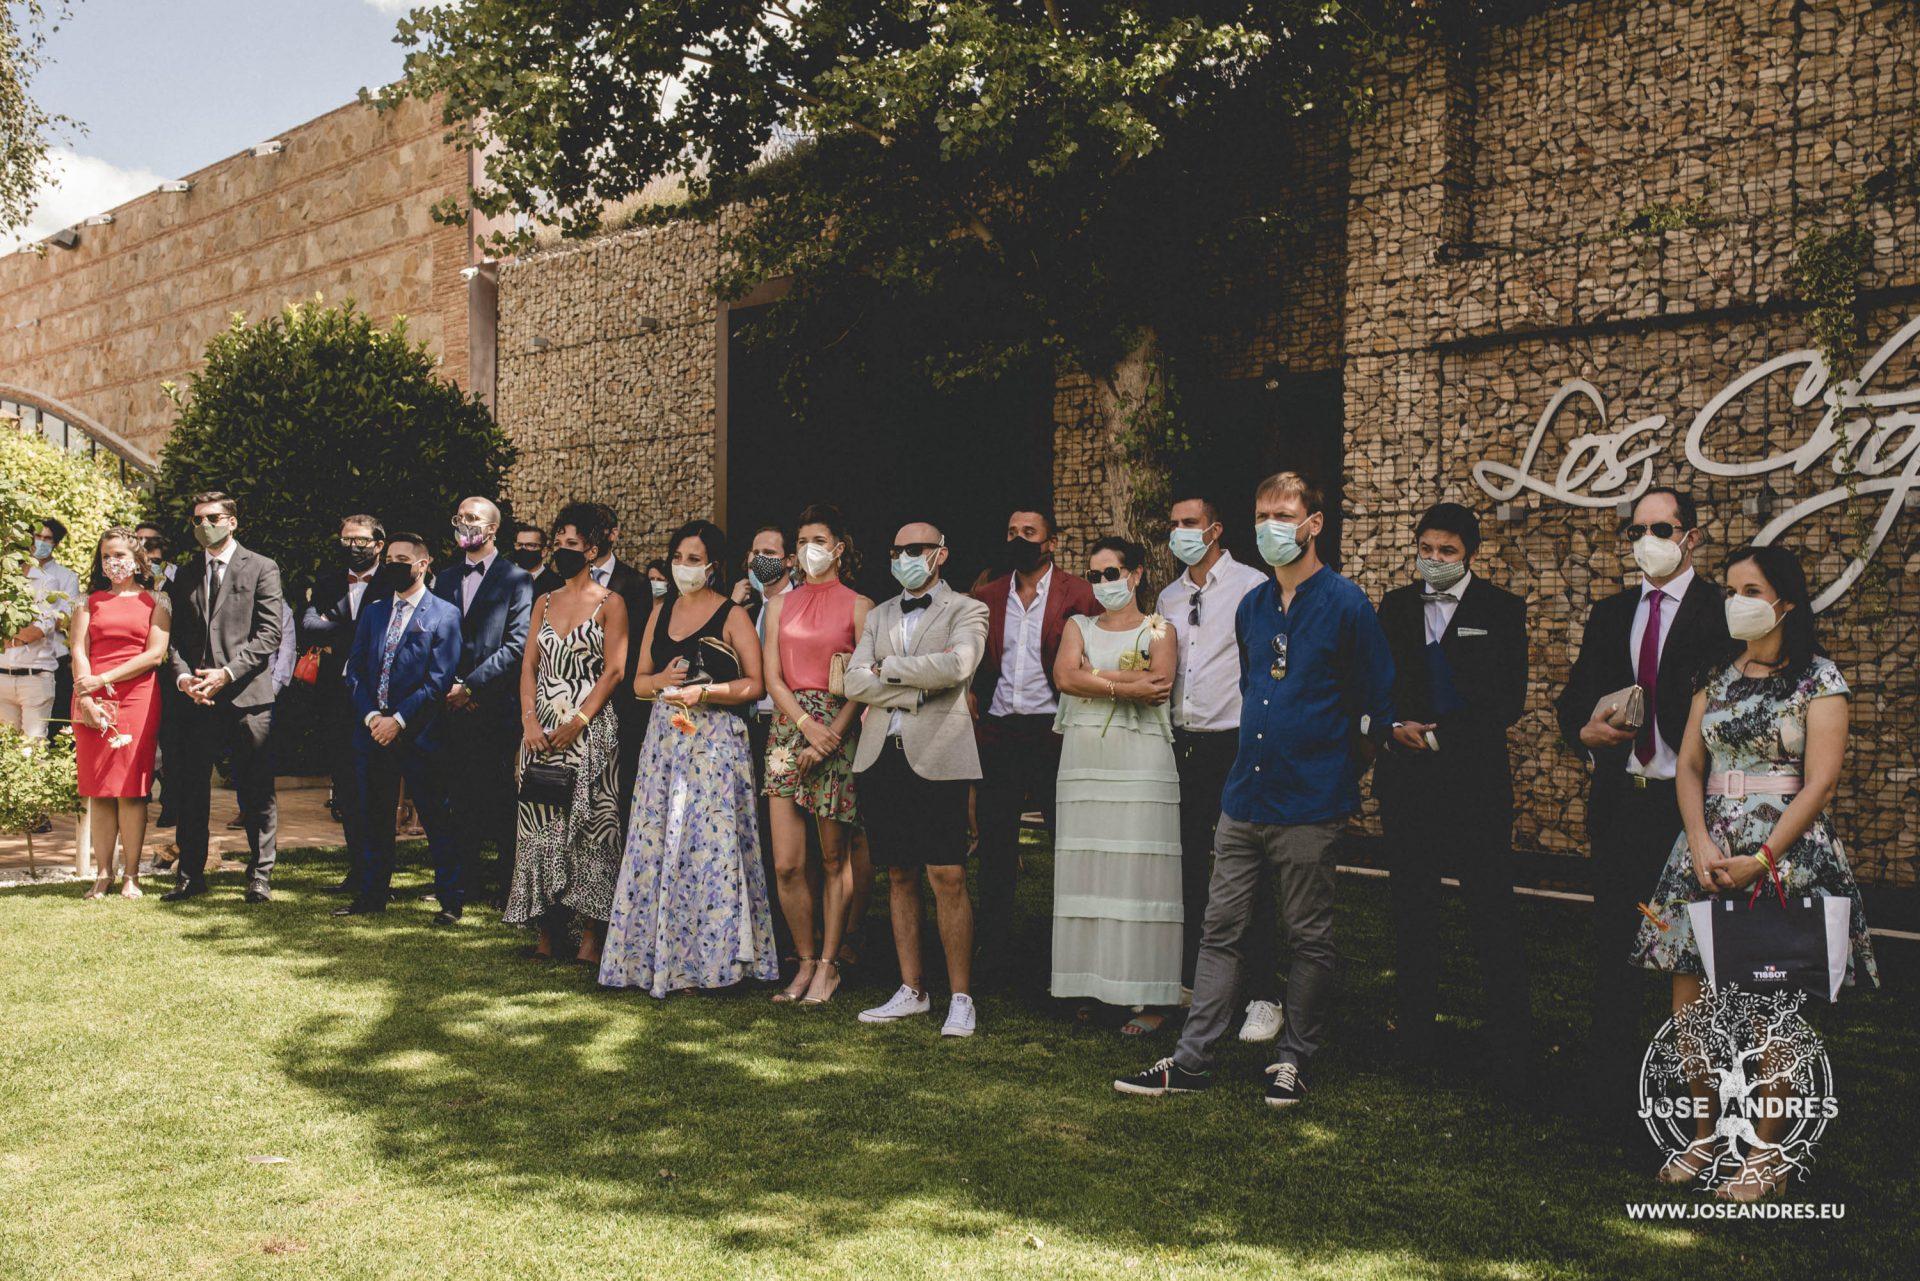 Boda en Los Chopos, boda en Albacete, fotógrafo de boda en Albacete, fotógrafo de boda en Cuenca, fotógrafo de boda en Valencia, fotografías de boda diferente